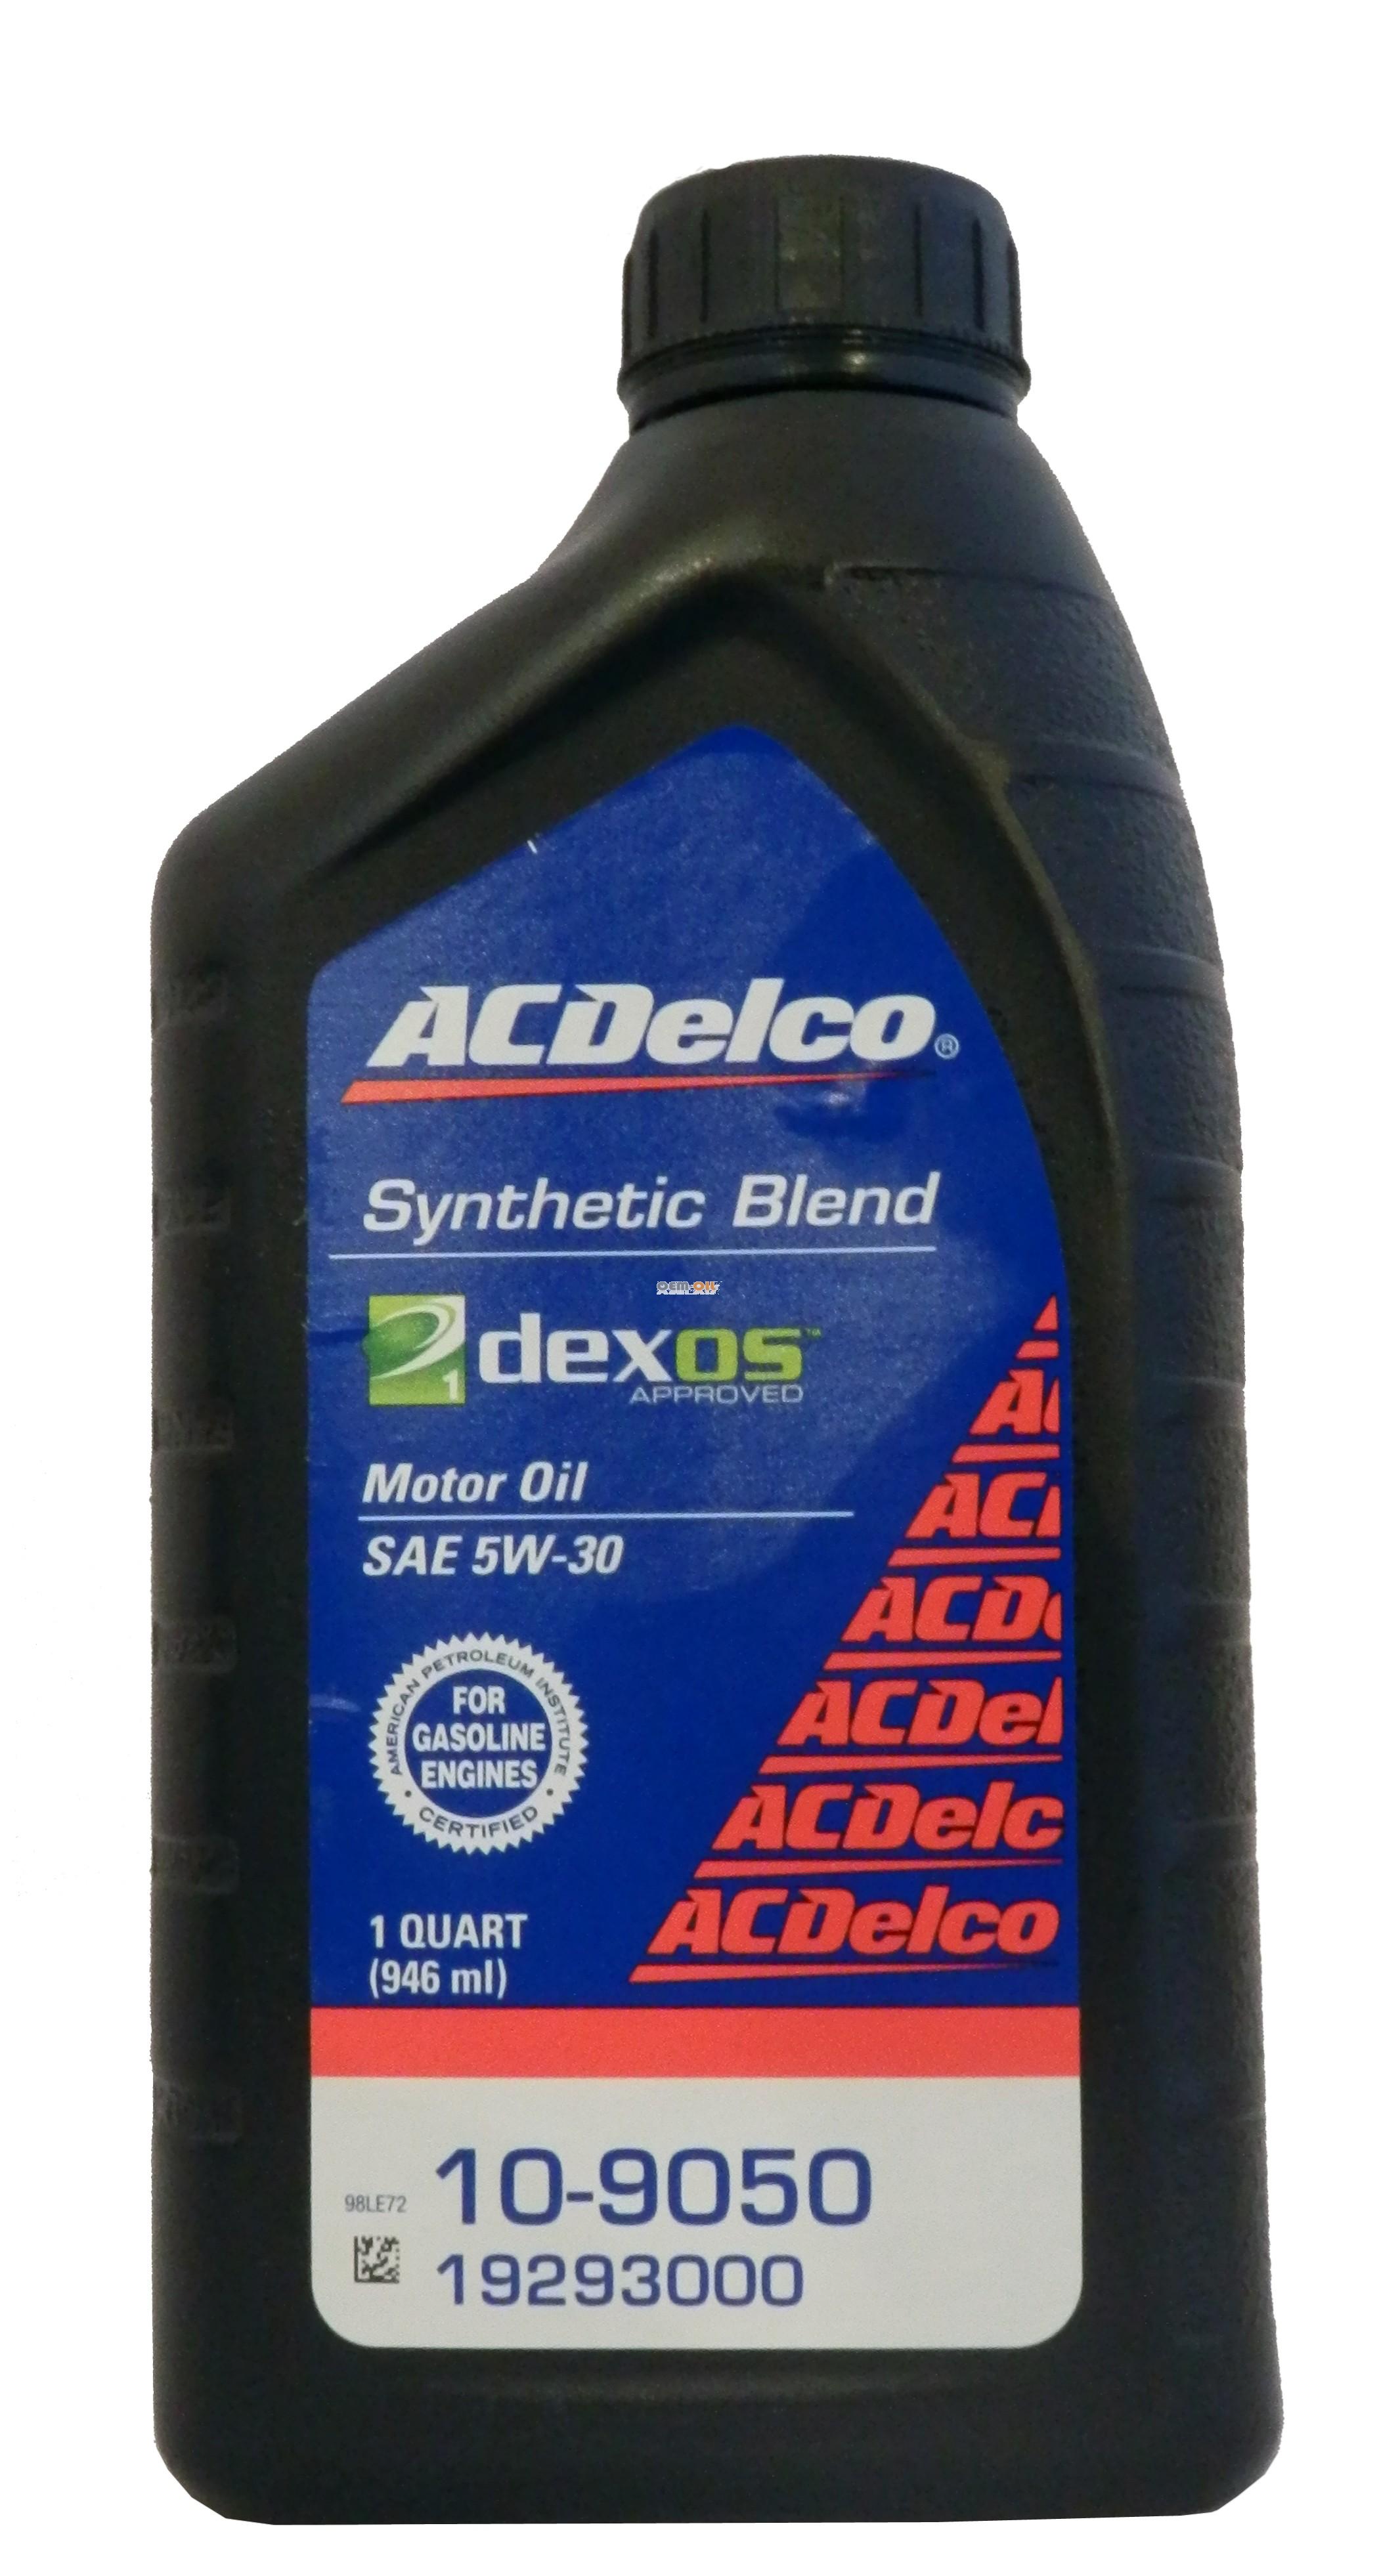 General Motors AC Delco Dexos 1 Synthetic Blend 5W-30